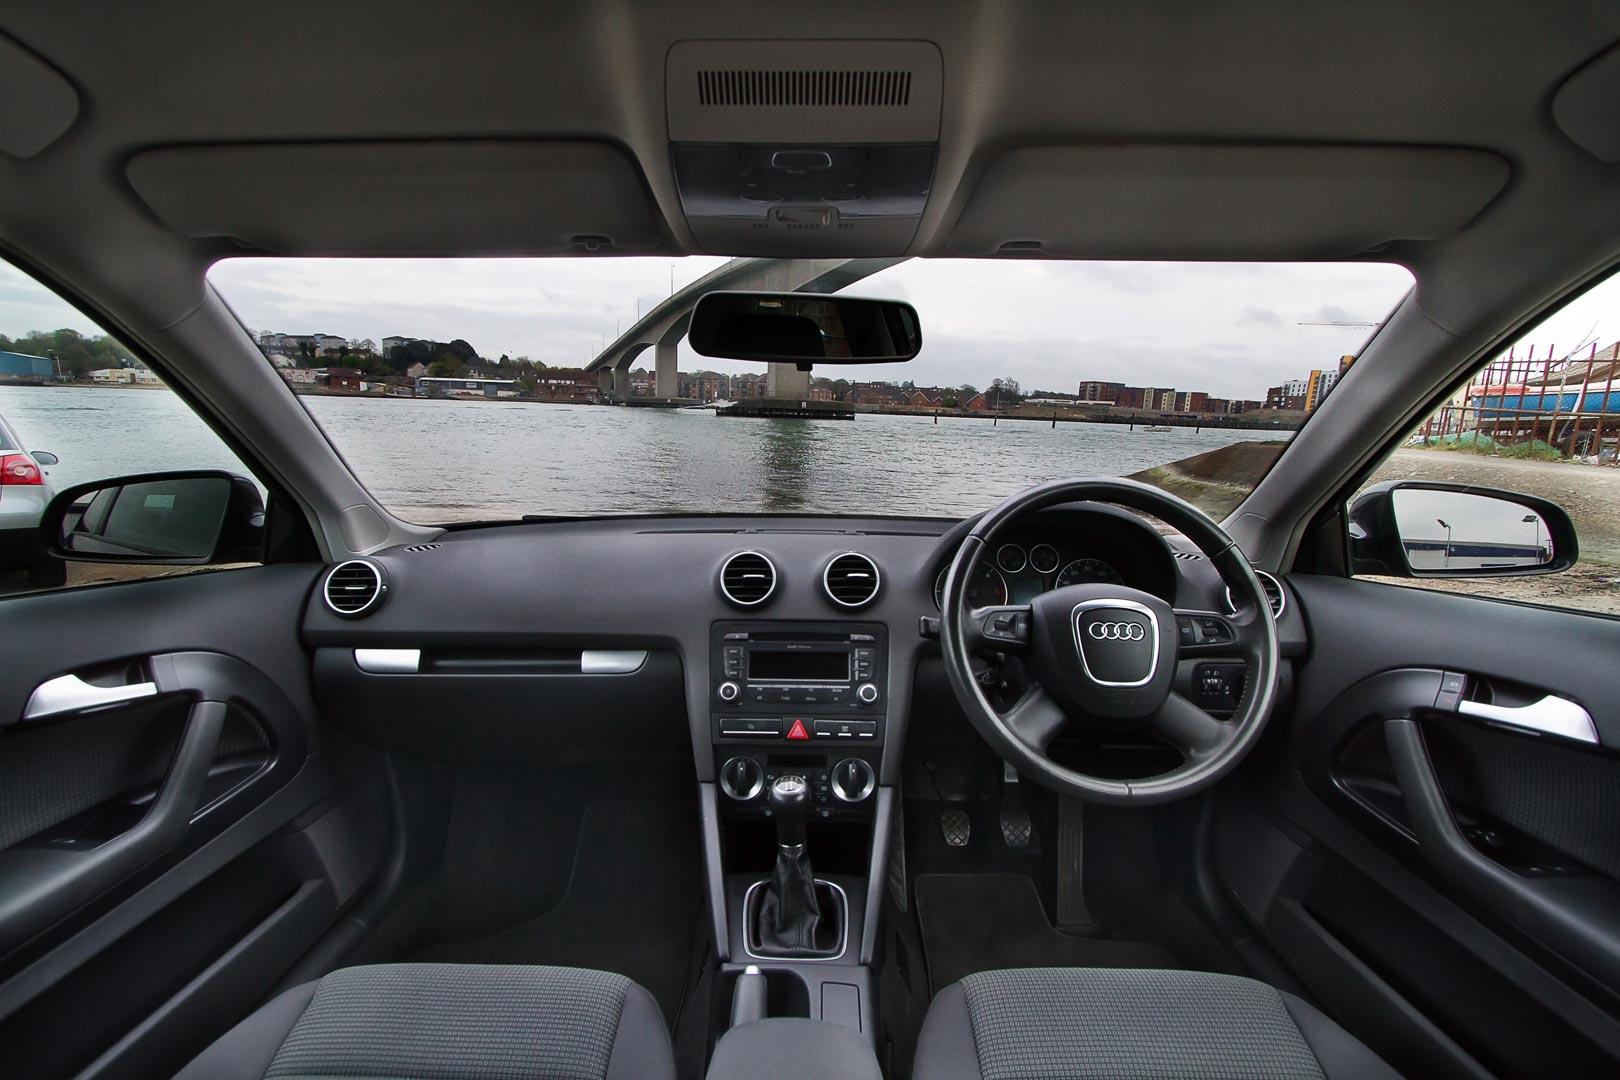 Audi_A3_013